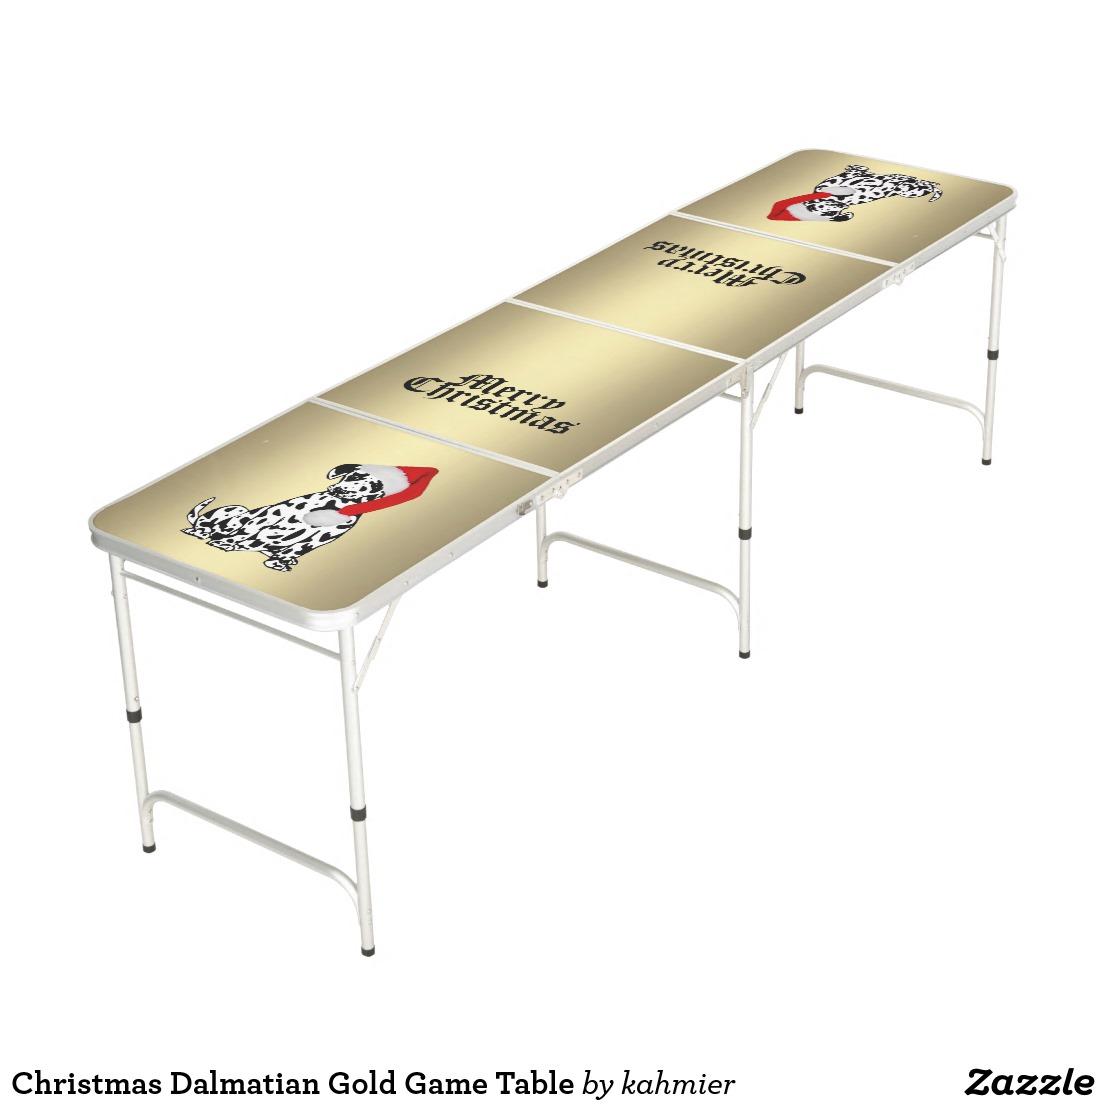 Christmas Dalmatian Gold Game Table